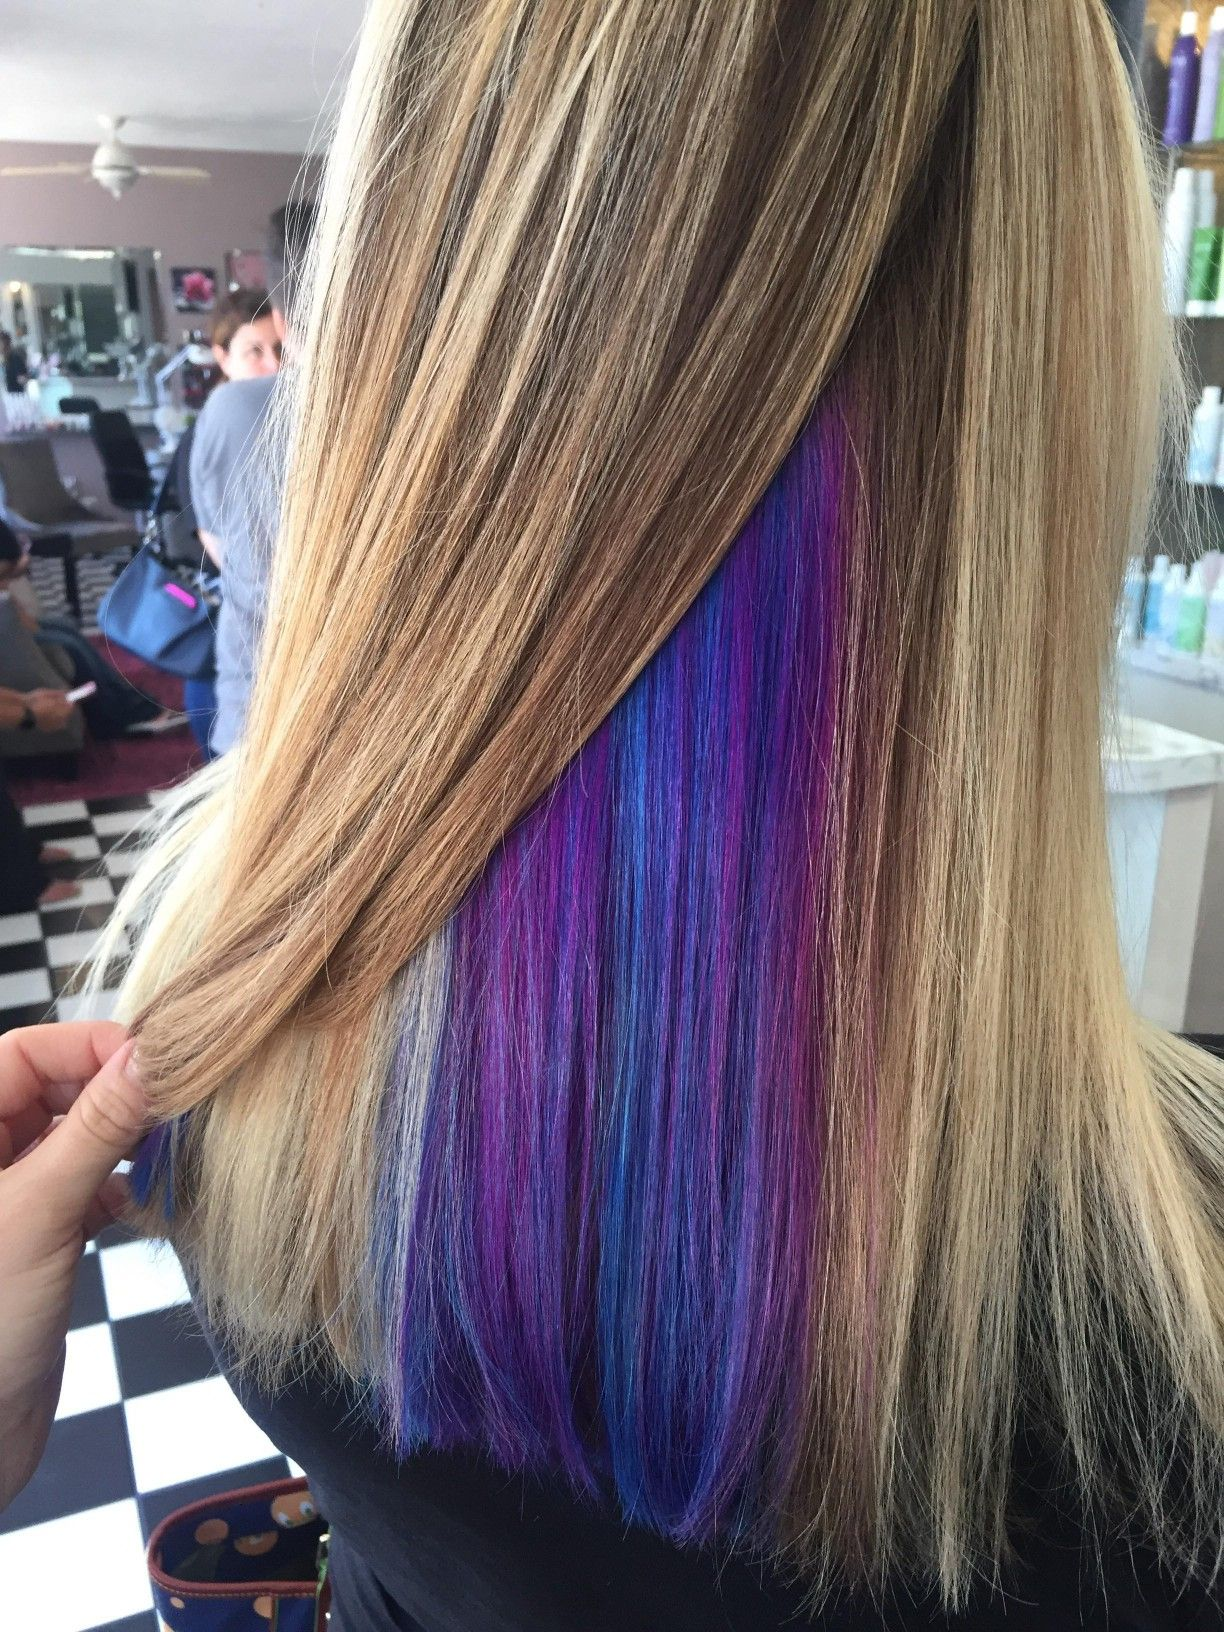 Peekaboo Purple Blue Highlights Peekaboo Hair Hidden Hair Color Purple Hair Highlights